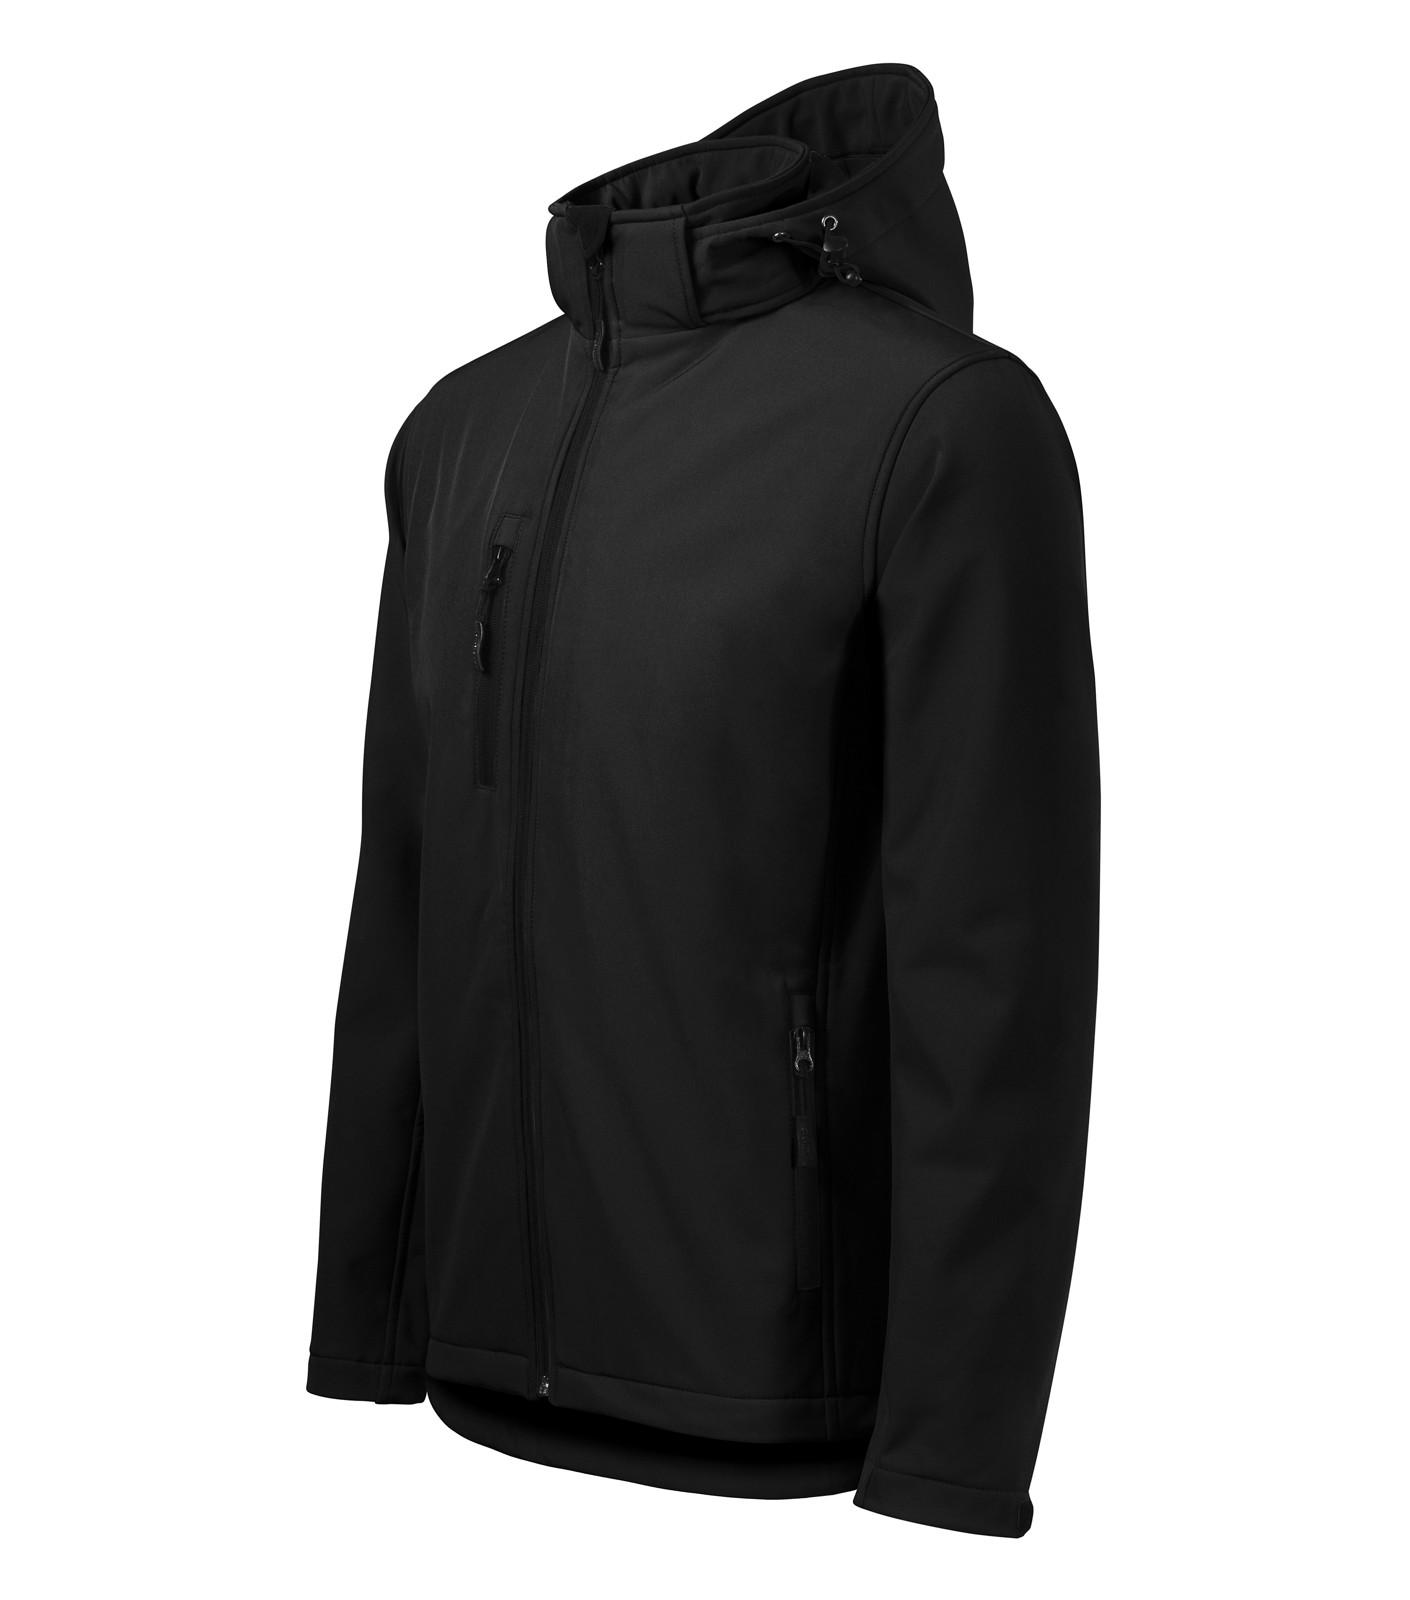 Softshell Jacket men's Malfini Performance - Black / 3XL